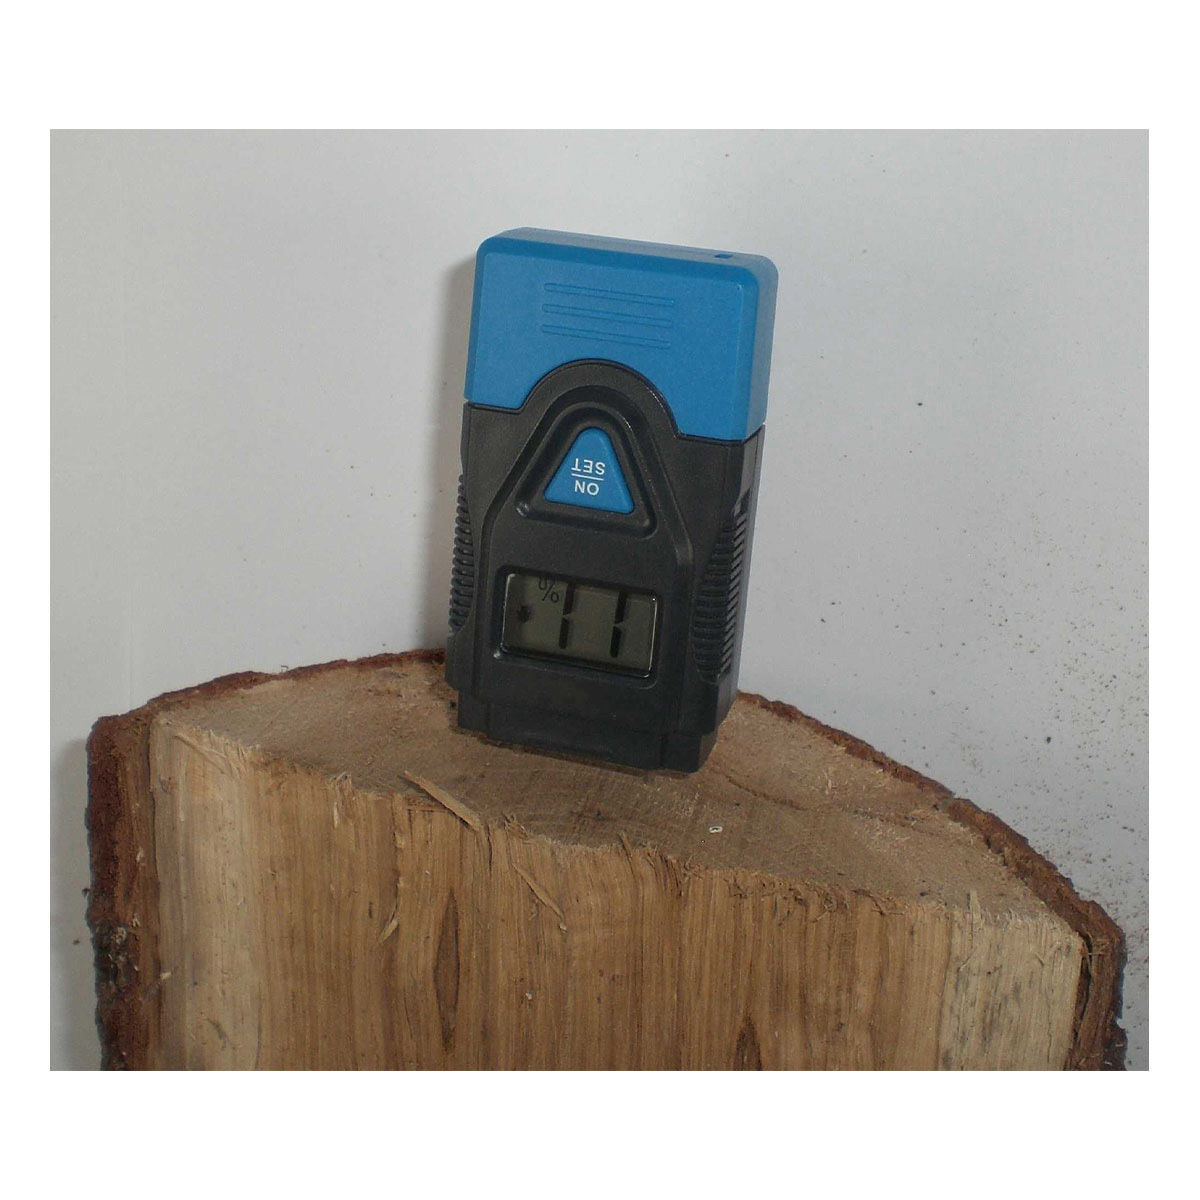 30-5502-materialfeuchtemessgerät-humidcheck-mini-anwendung2-1200x1200px.jpg